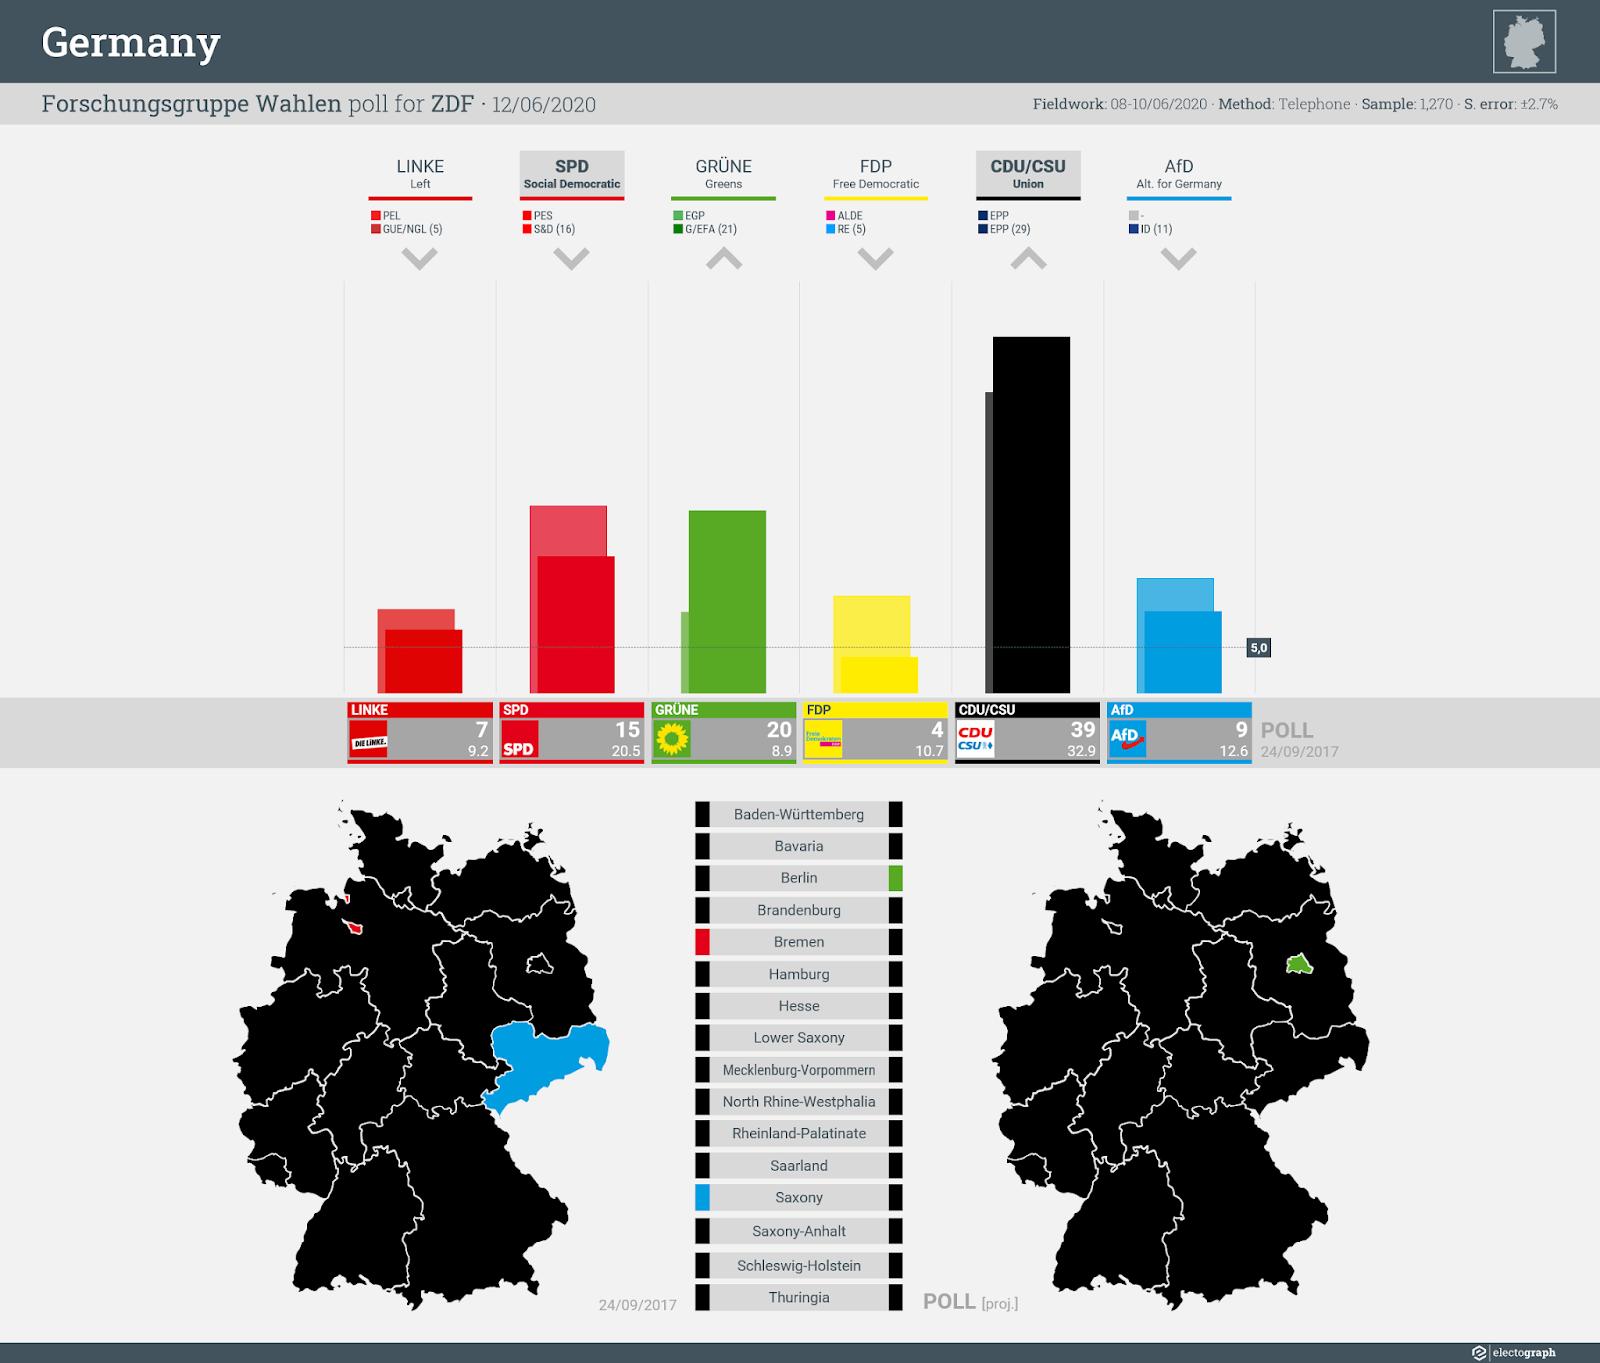 GERMANY: Forschungsgruppe Wahlen poll chart for ZDF, 12 June 2020